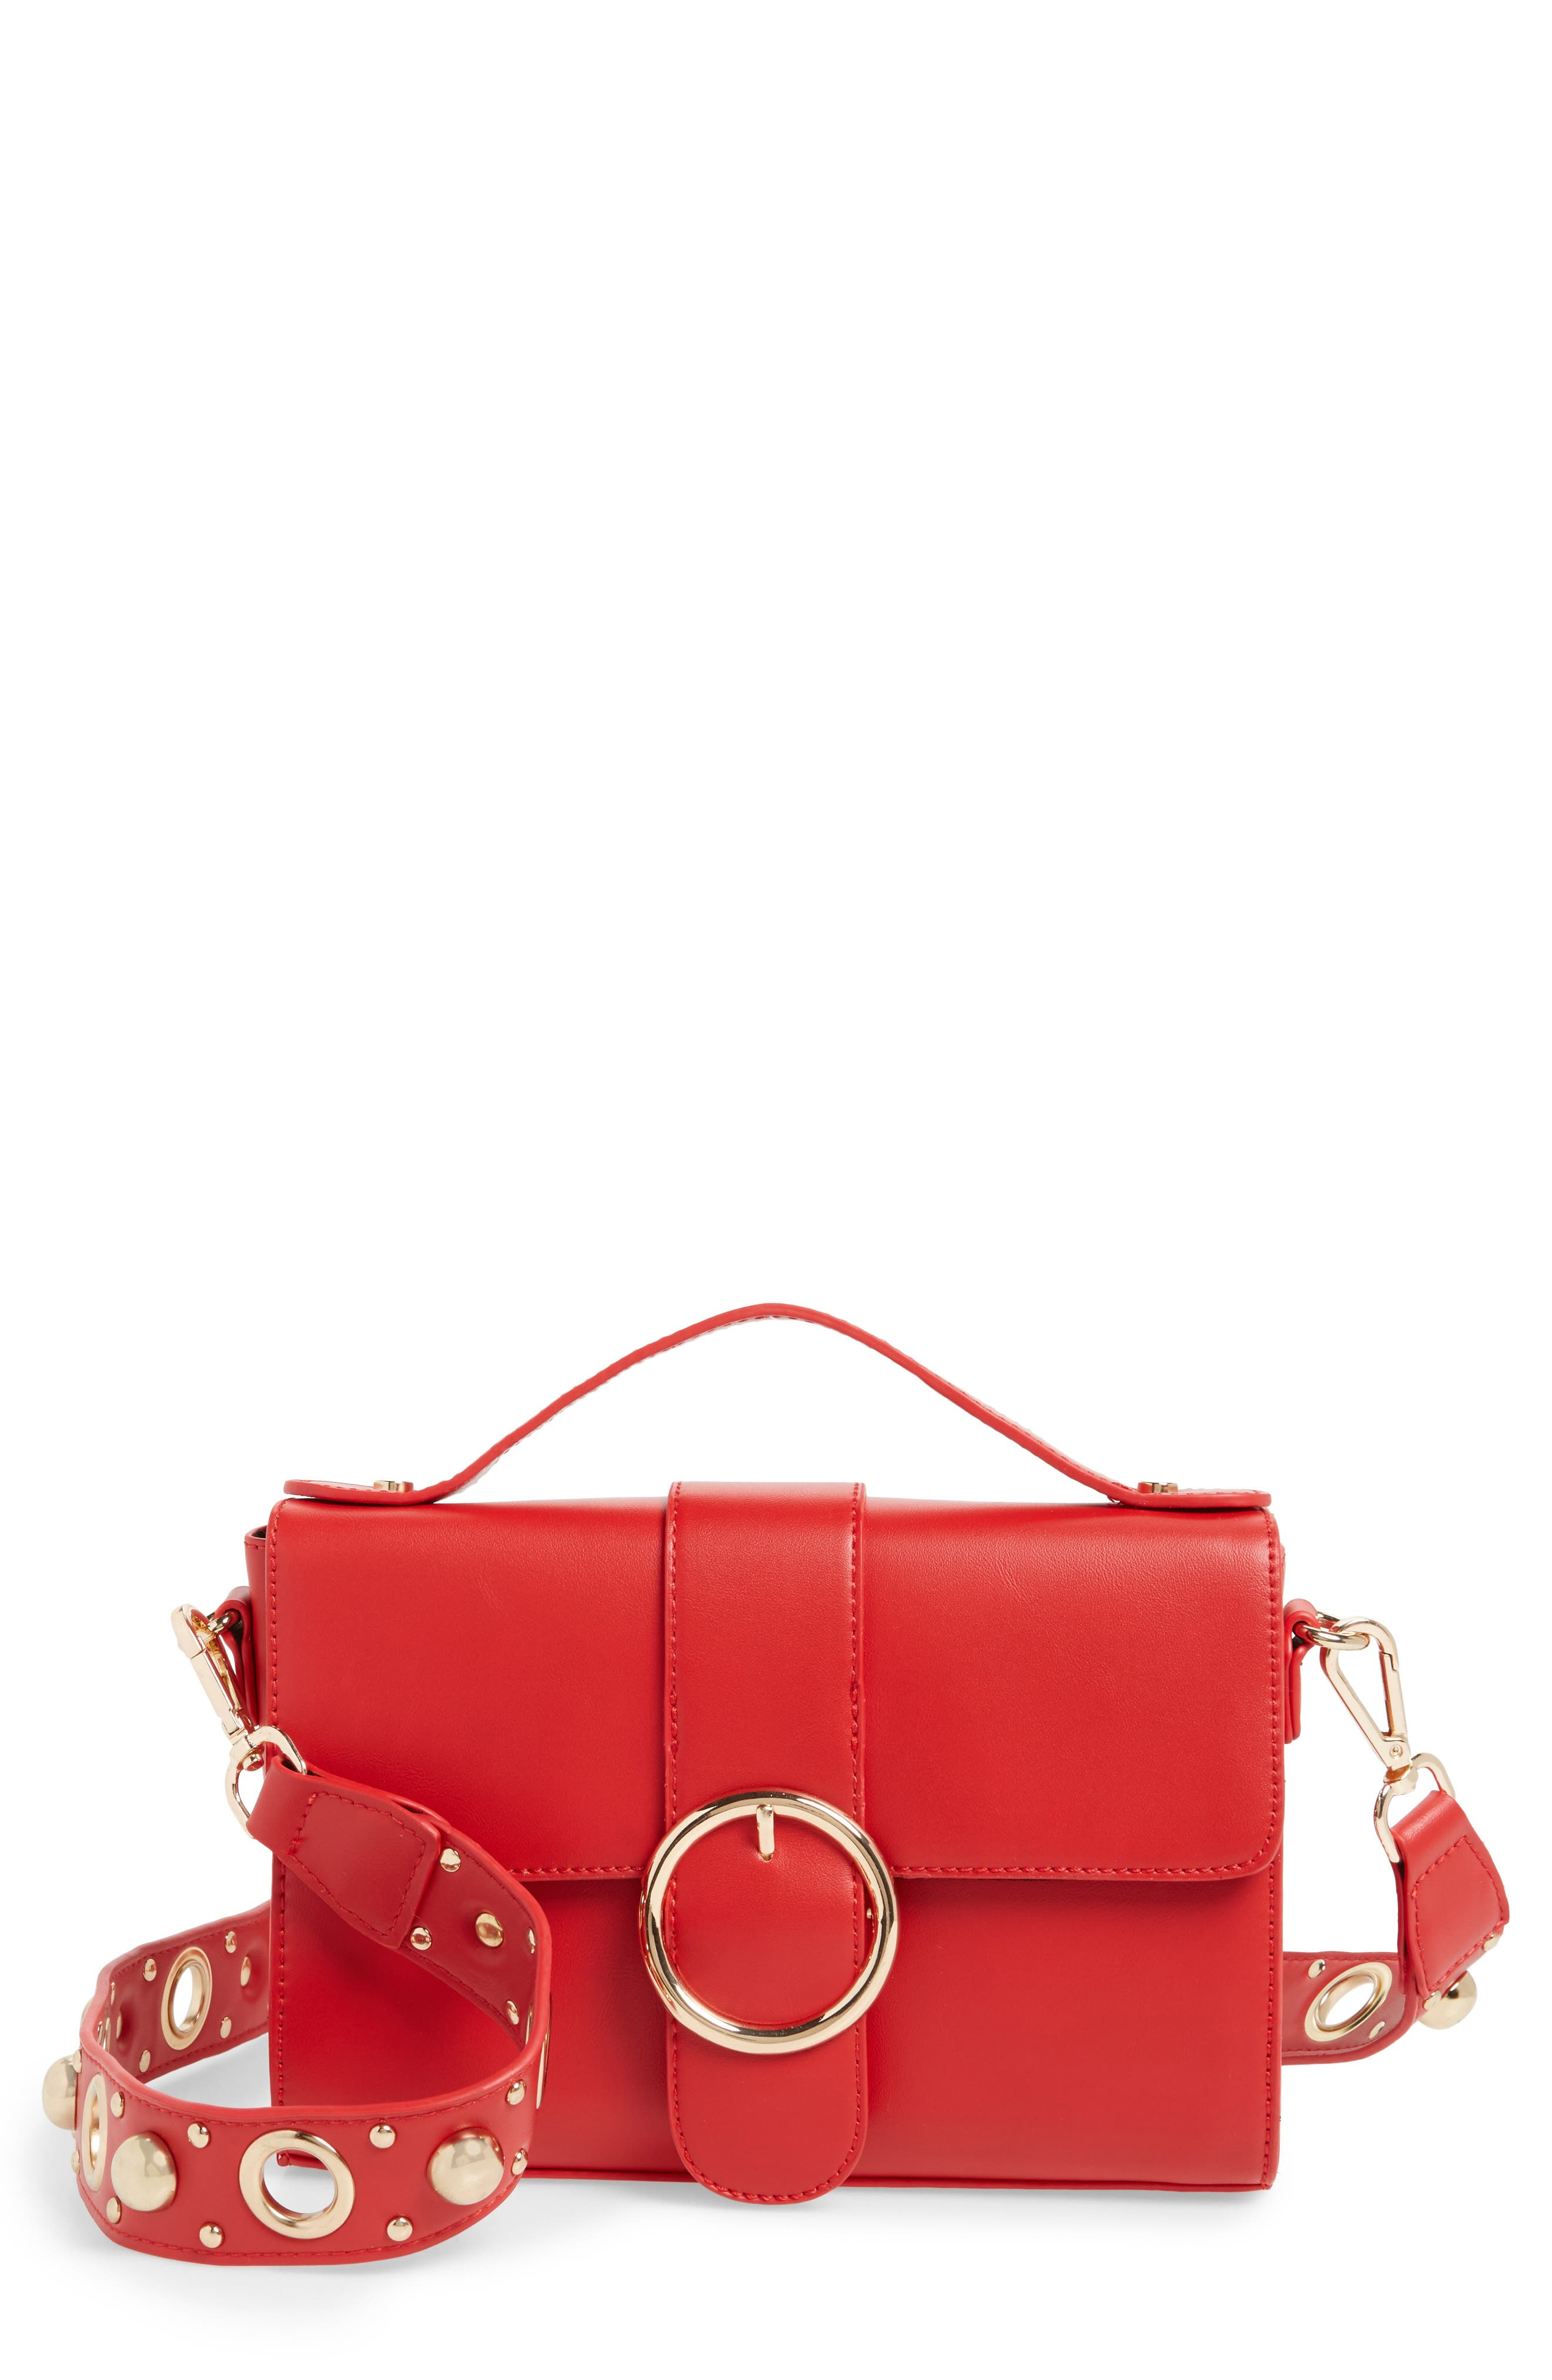 Main Image - Street Level Studded Strap Crossbody Bag